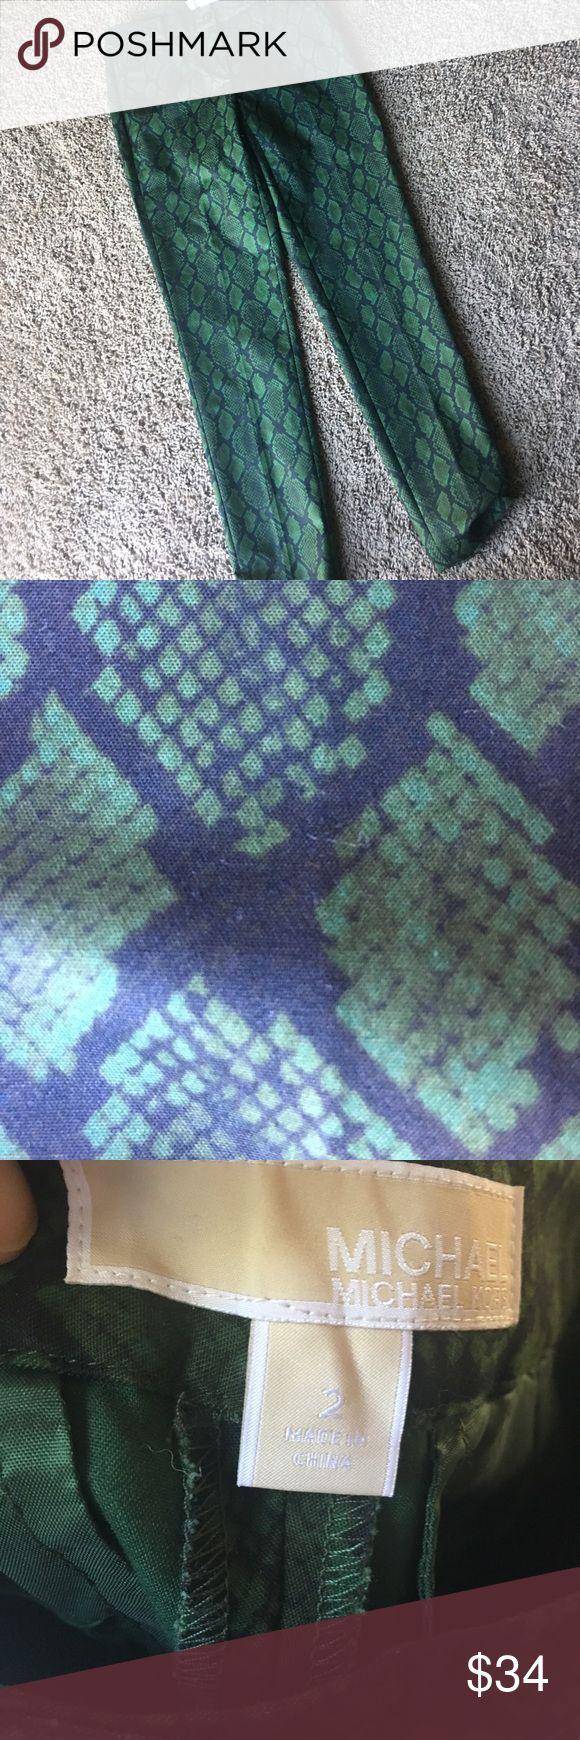 NWOT Michael Kors snake print pants NWOT. Slim leg. Ankle length KORS Michael Kors Pants Ankle & Cropped